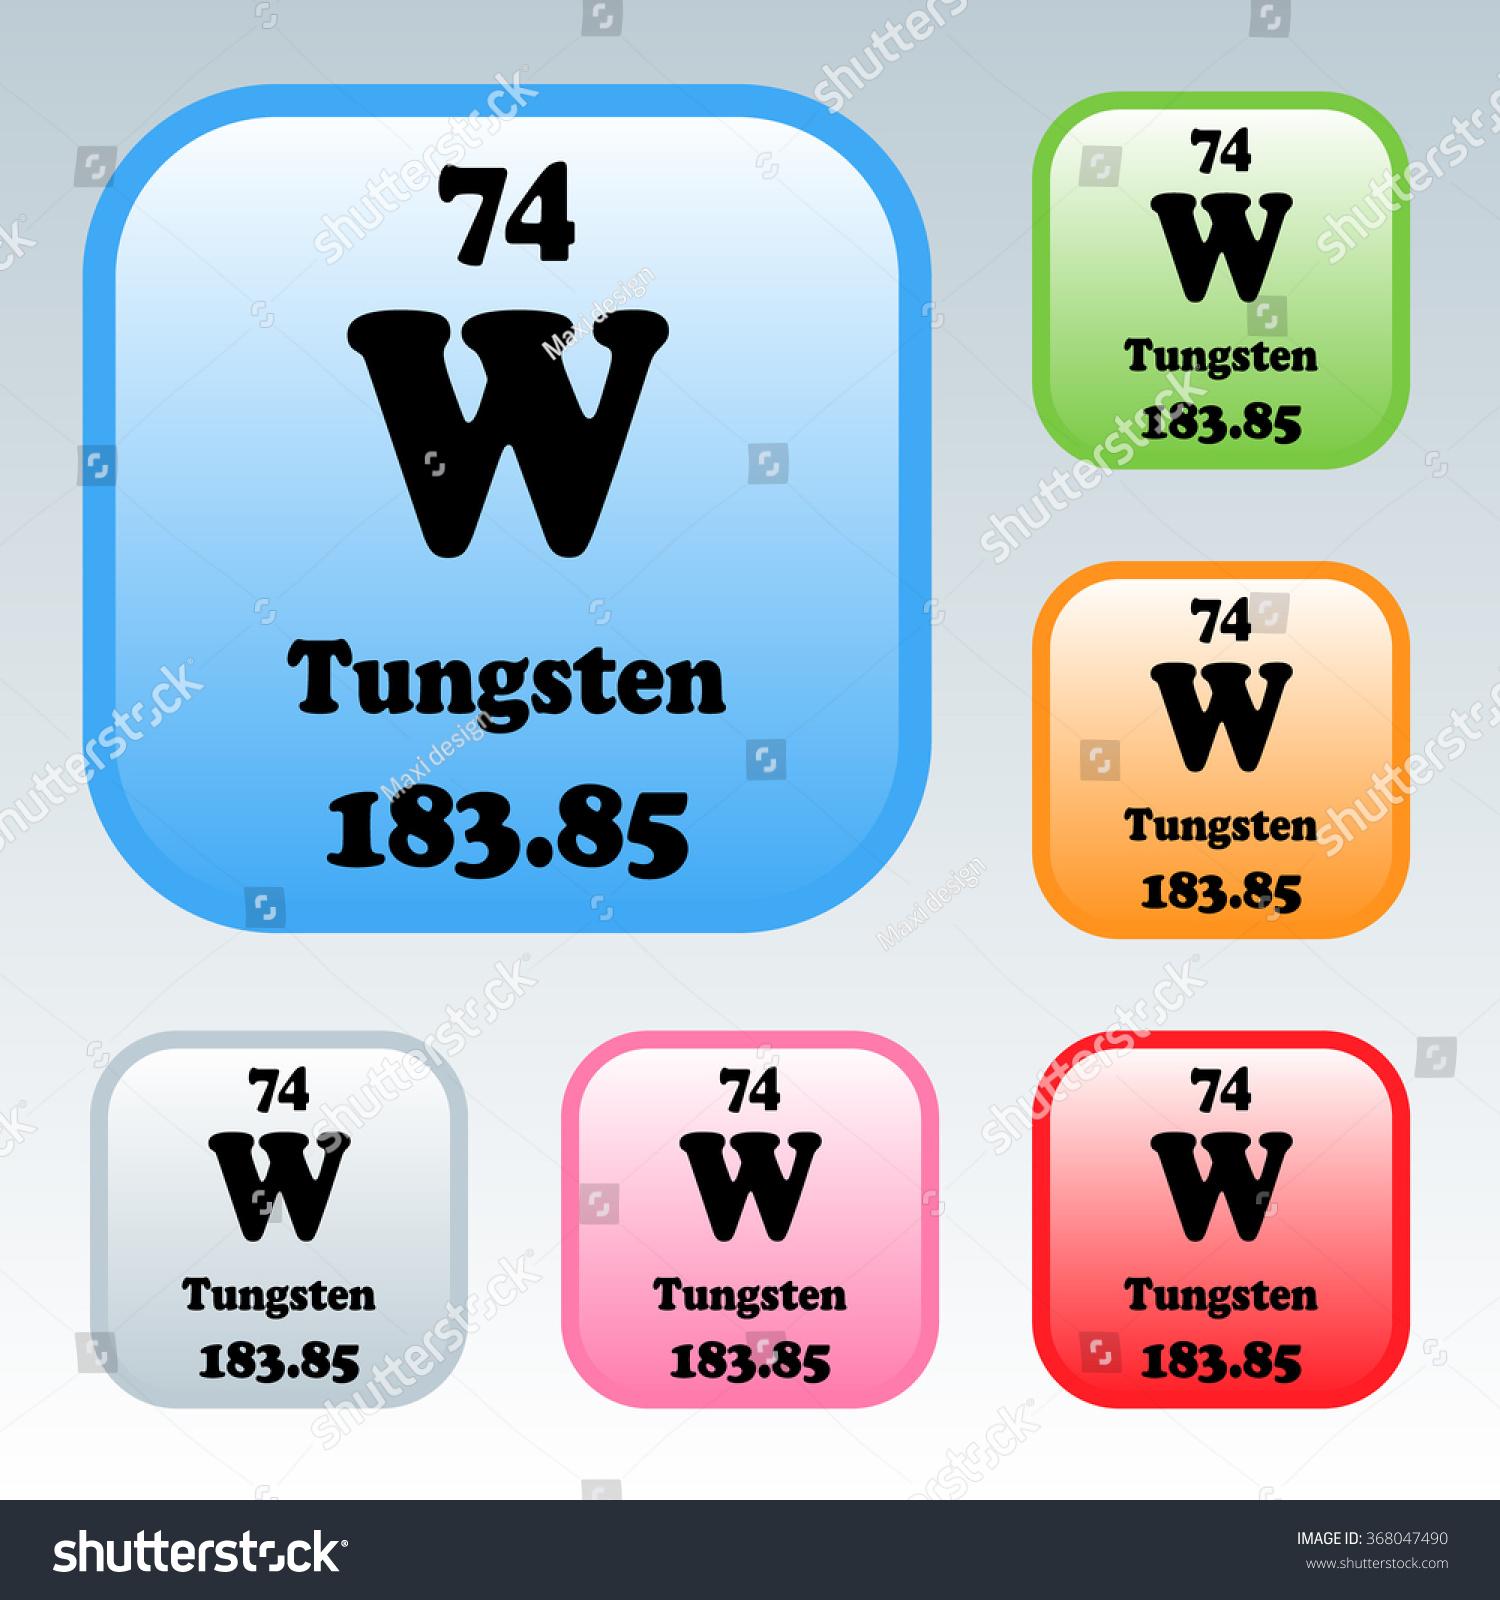 Periodic table elements tungsten stock vector 368047490 shutterstock the periodic table of the elements tungsten urtaz Gallery